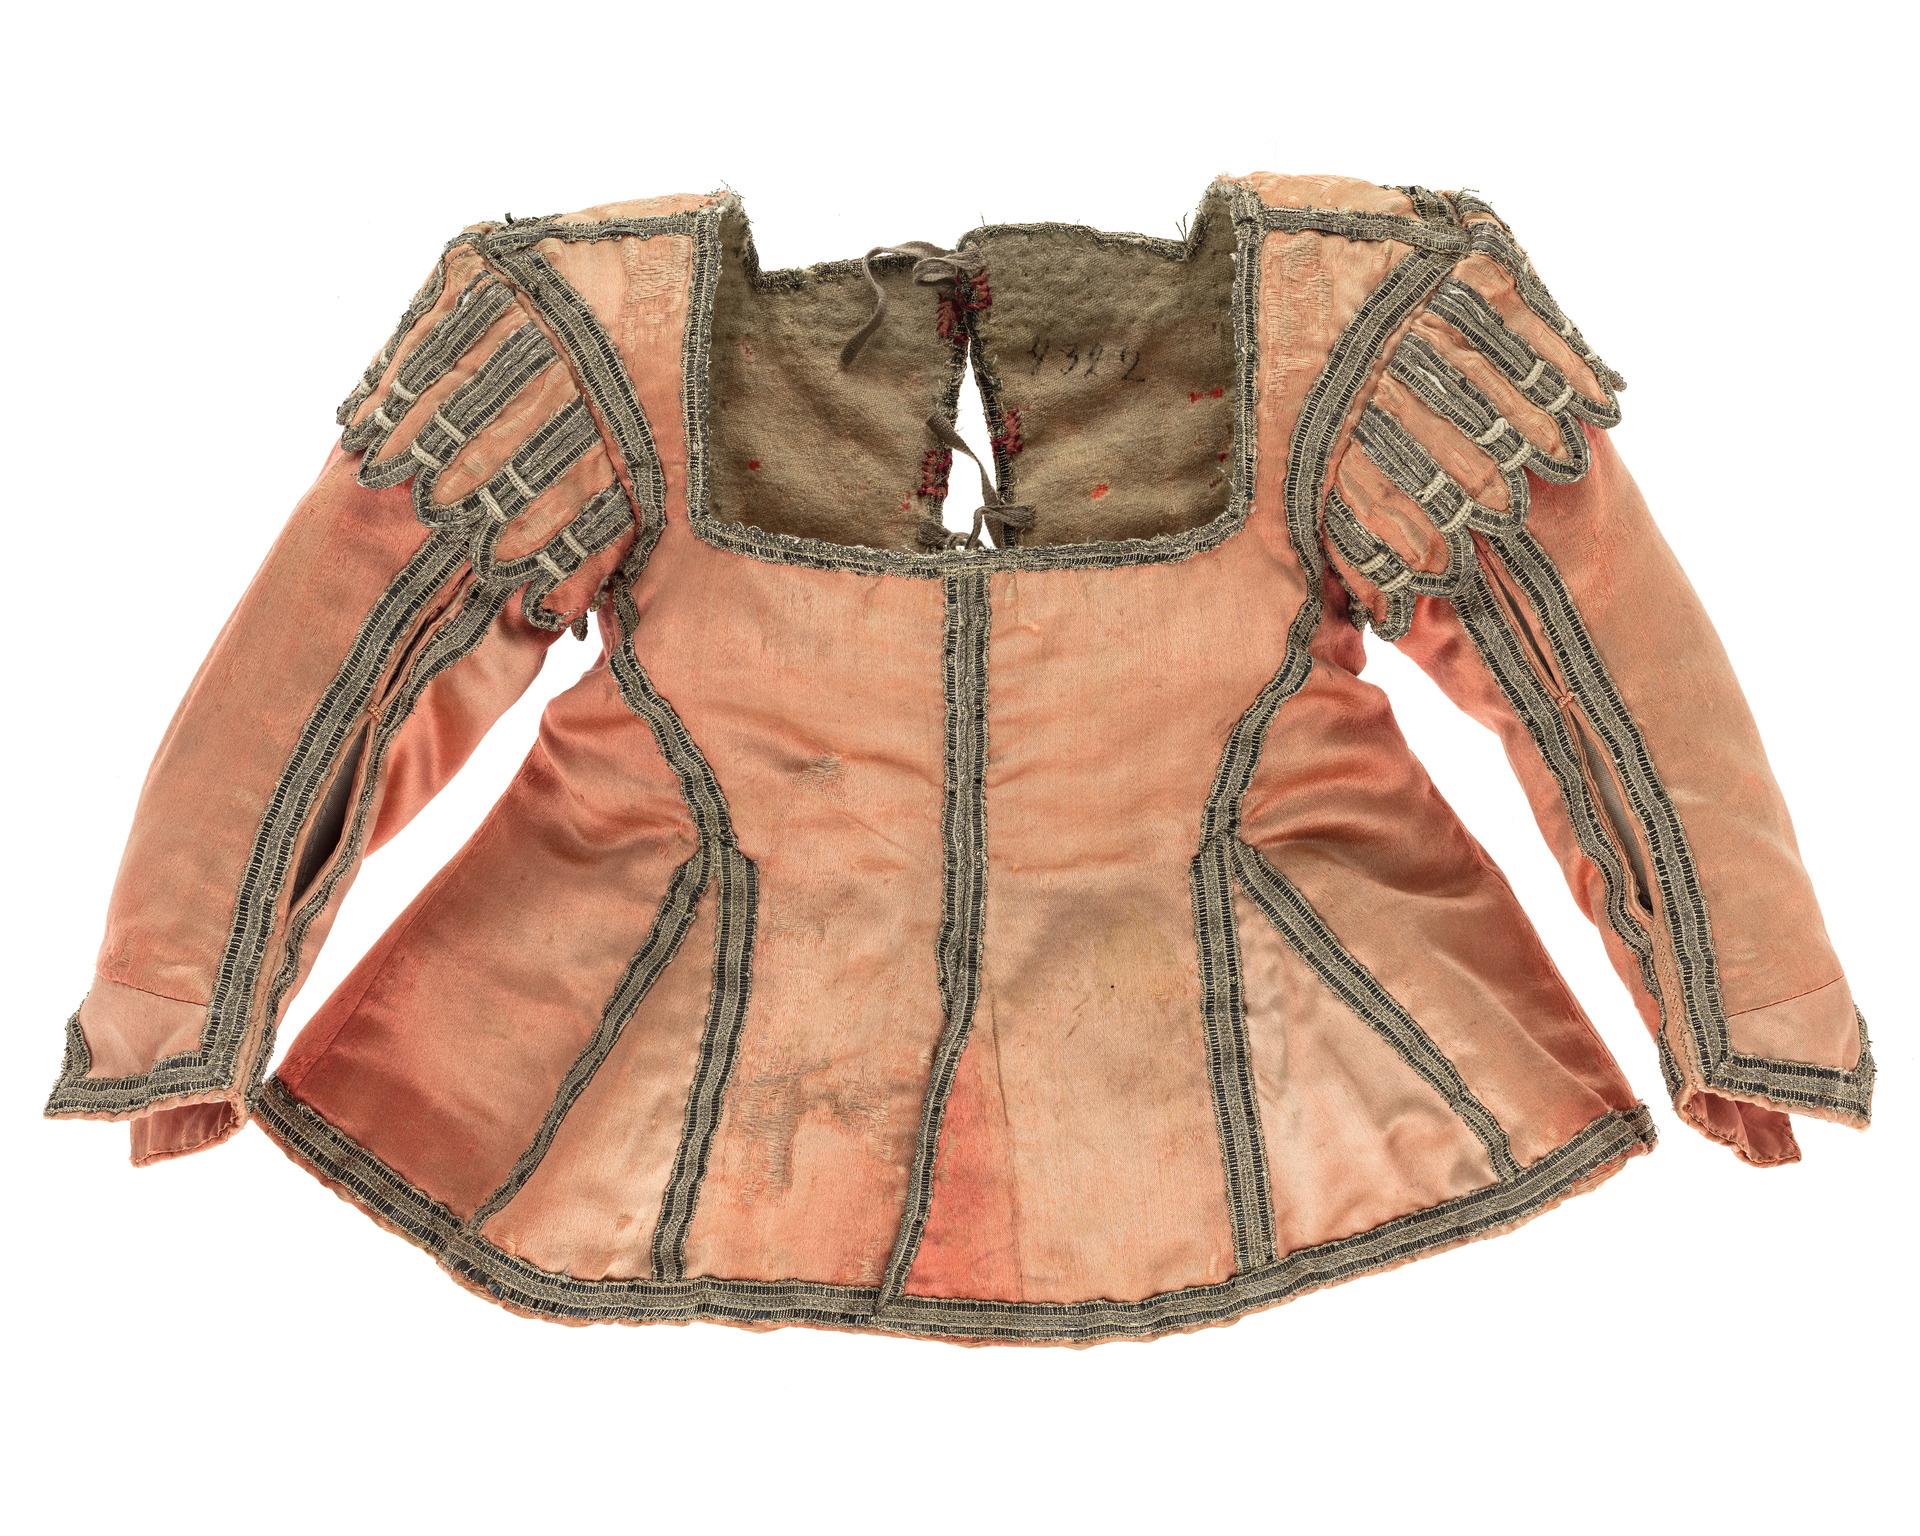 Tröja, som mer ser ut som en modern jacka, i rosa siden med kanter av silver.